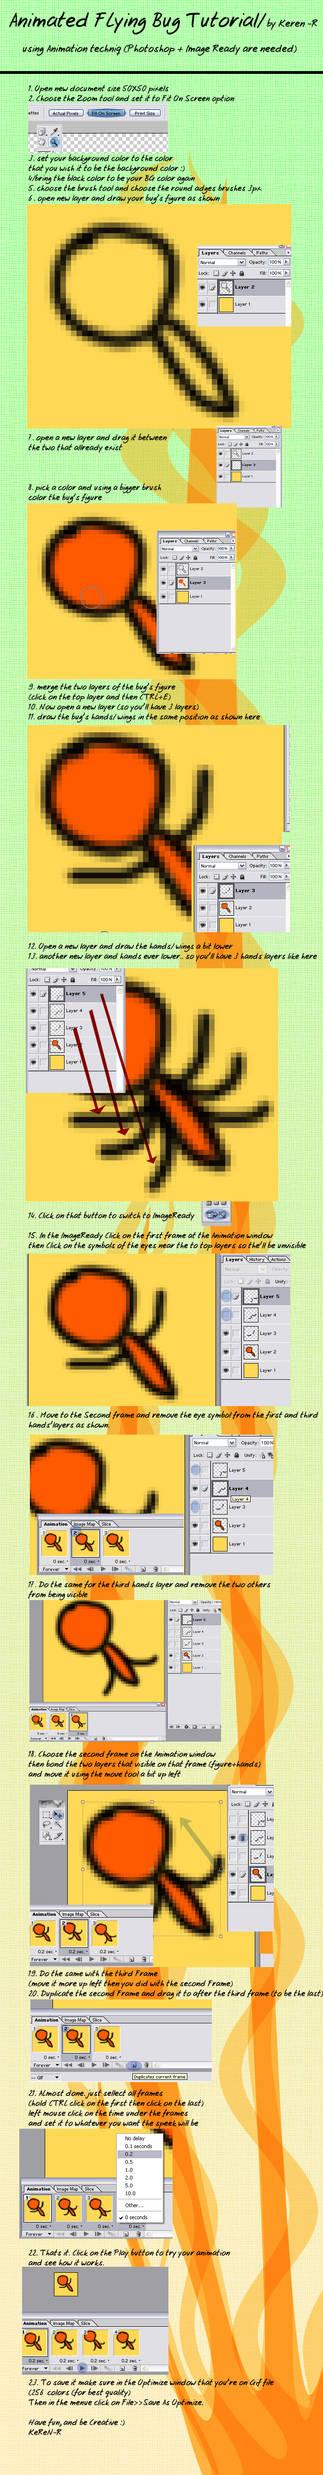 Animated Flying bug Tutorial